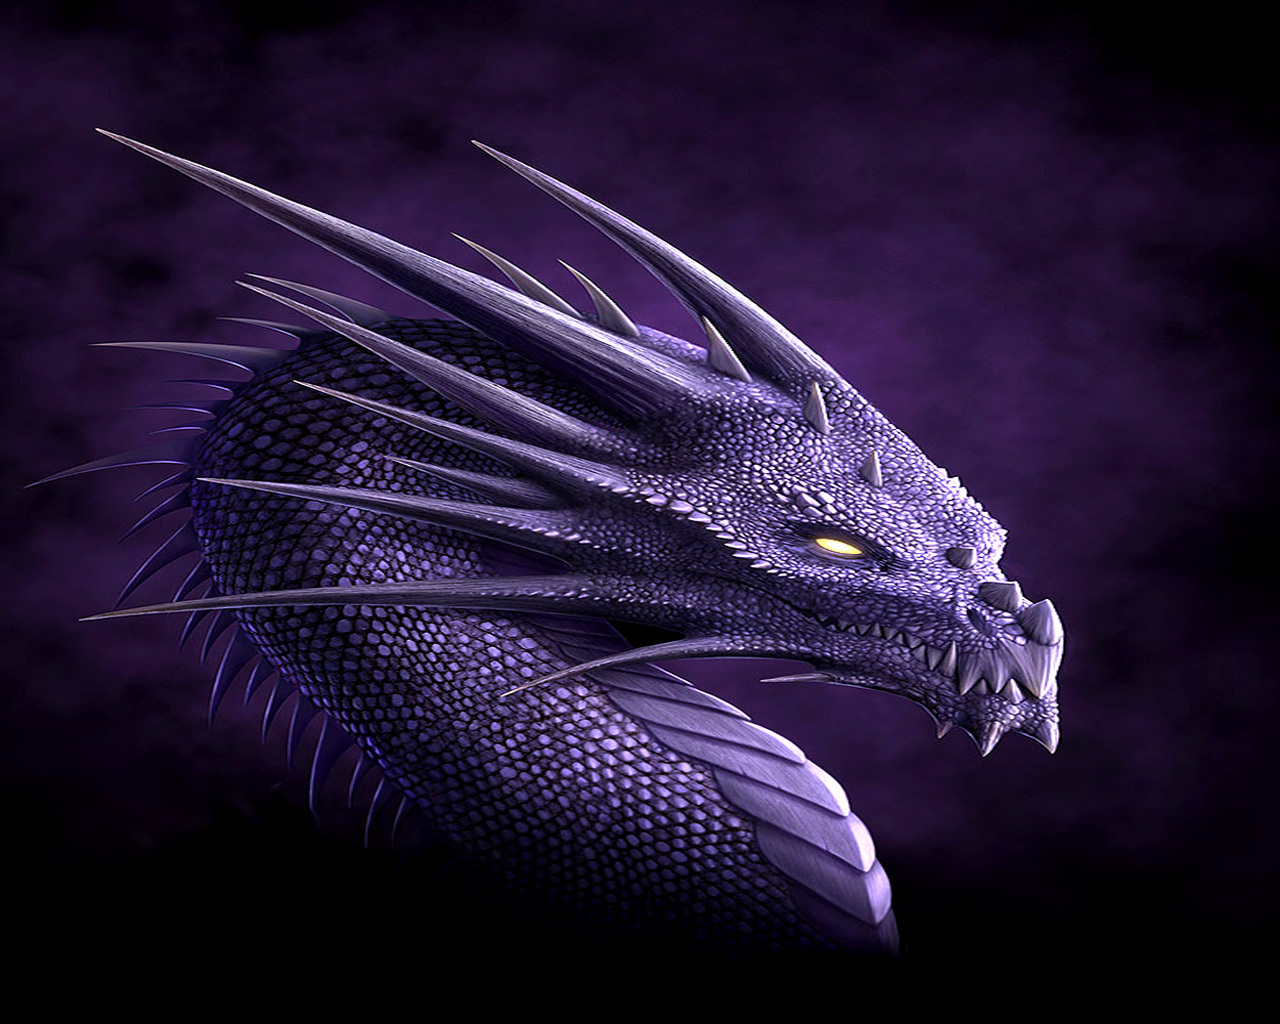 Dragons images Dragon Wallpaper HD wallpaper and 1280x1024